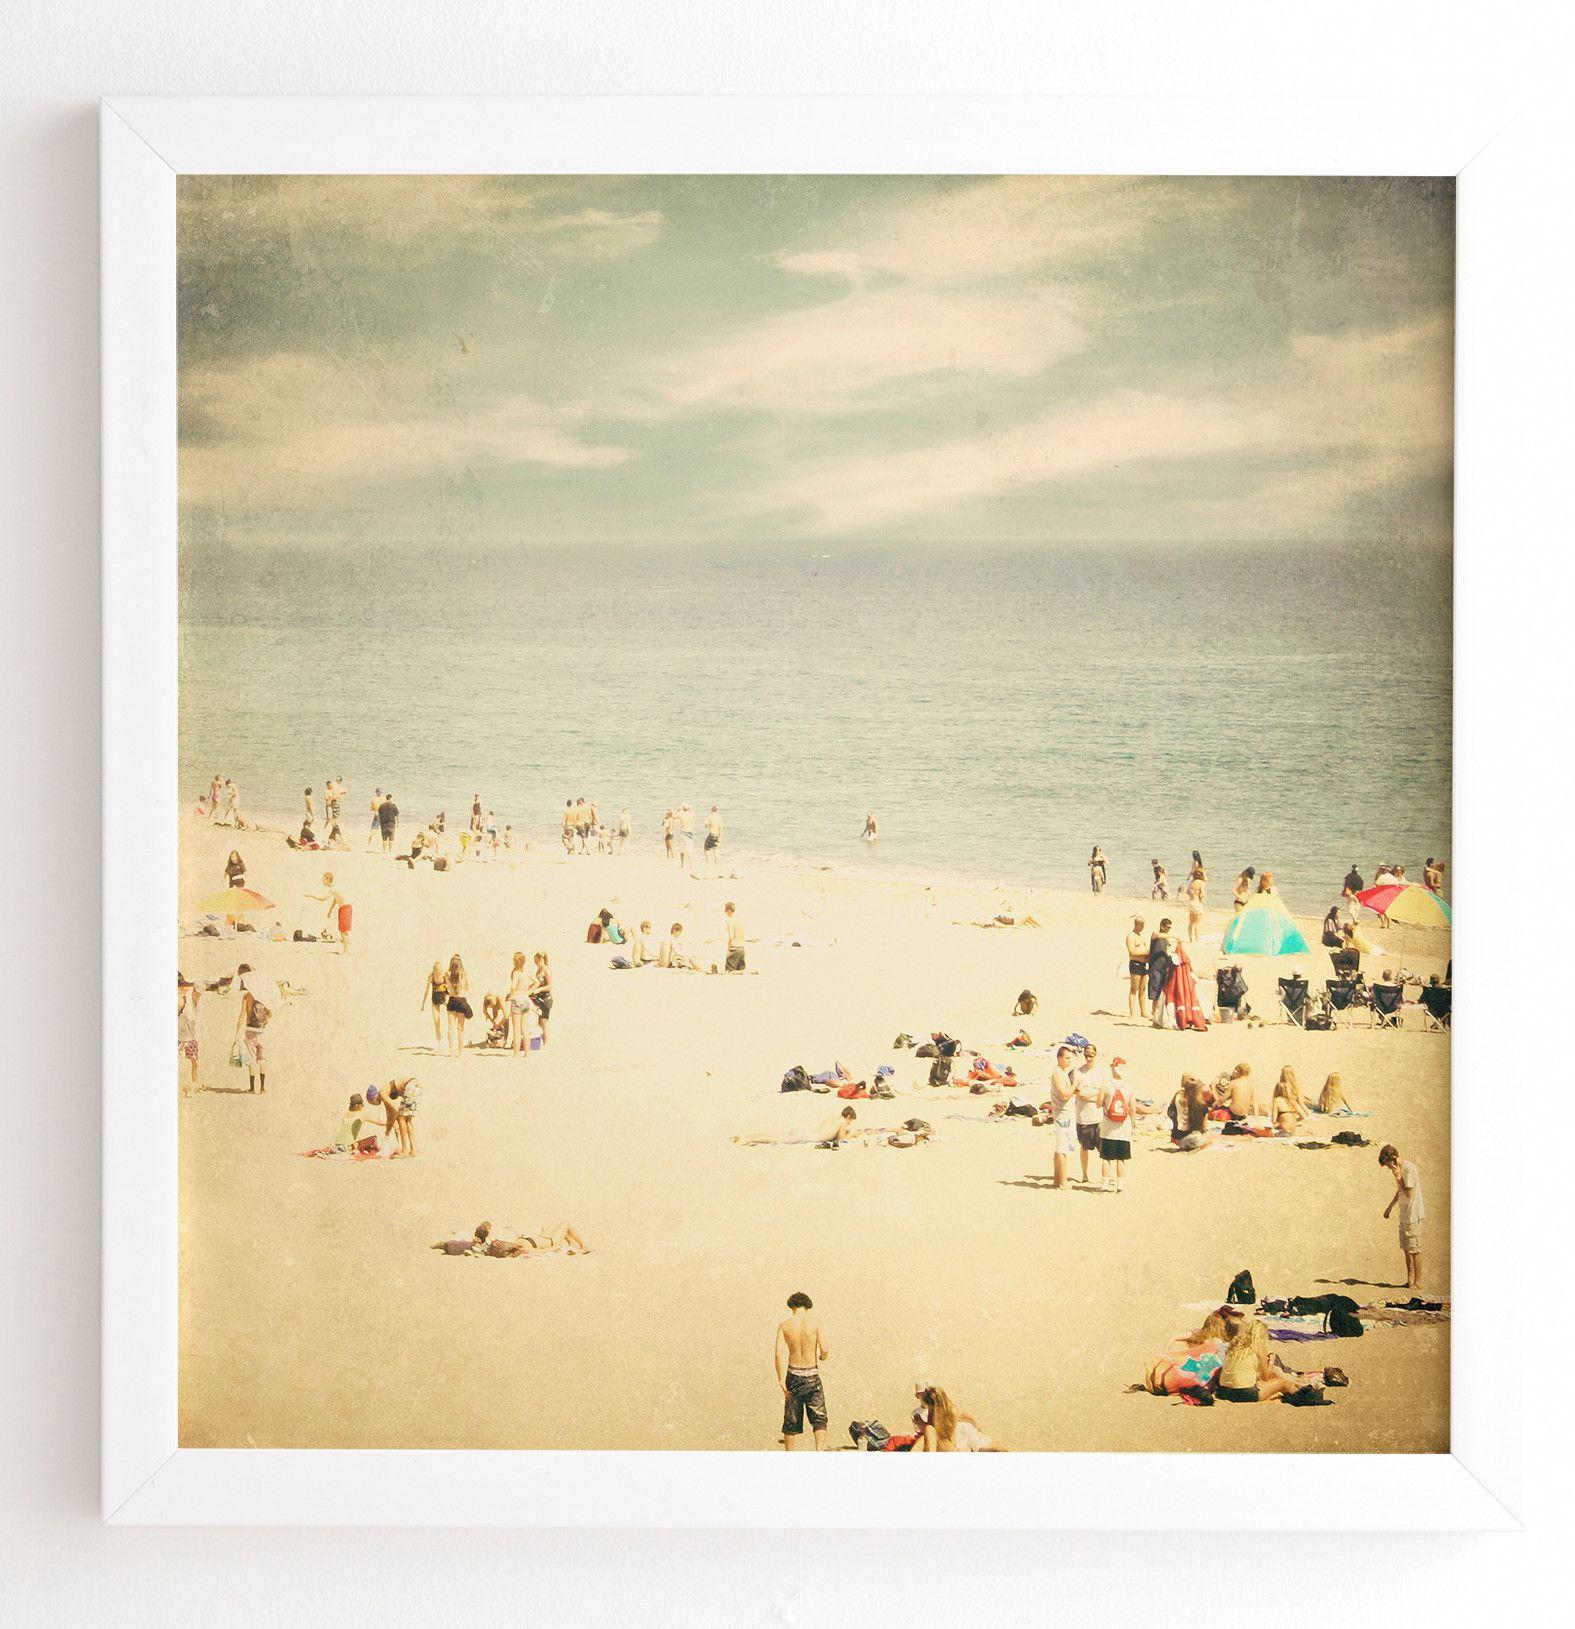 Vintage Beach Framed Photographic Print